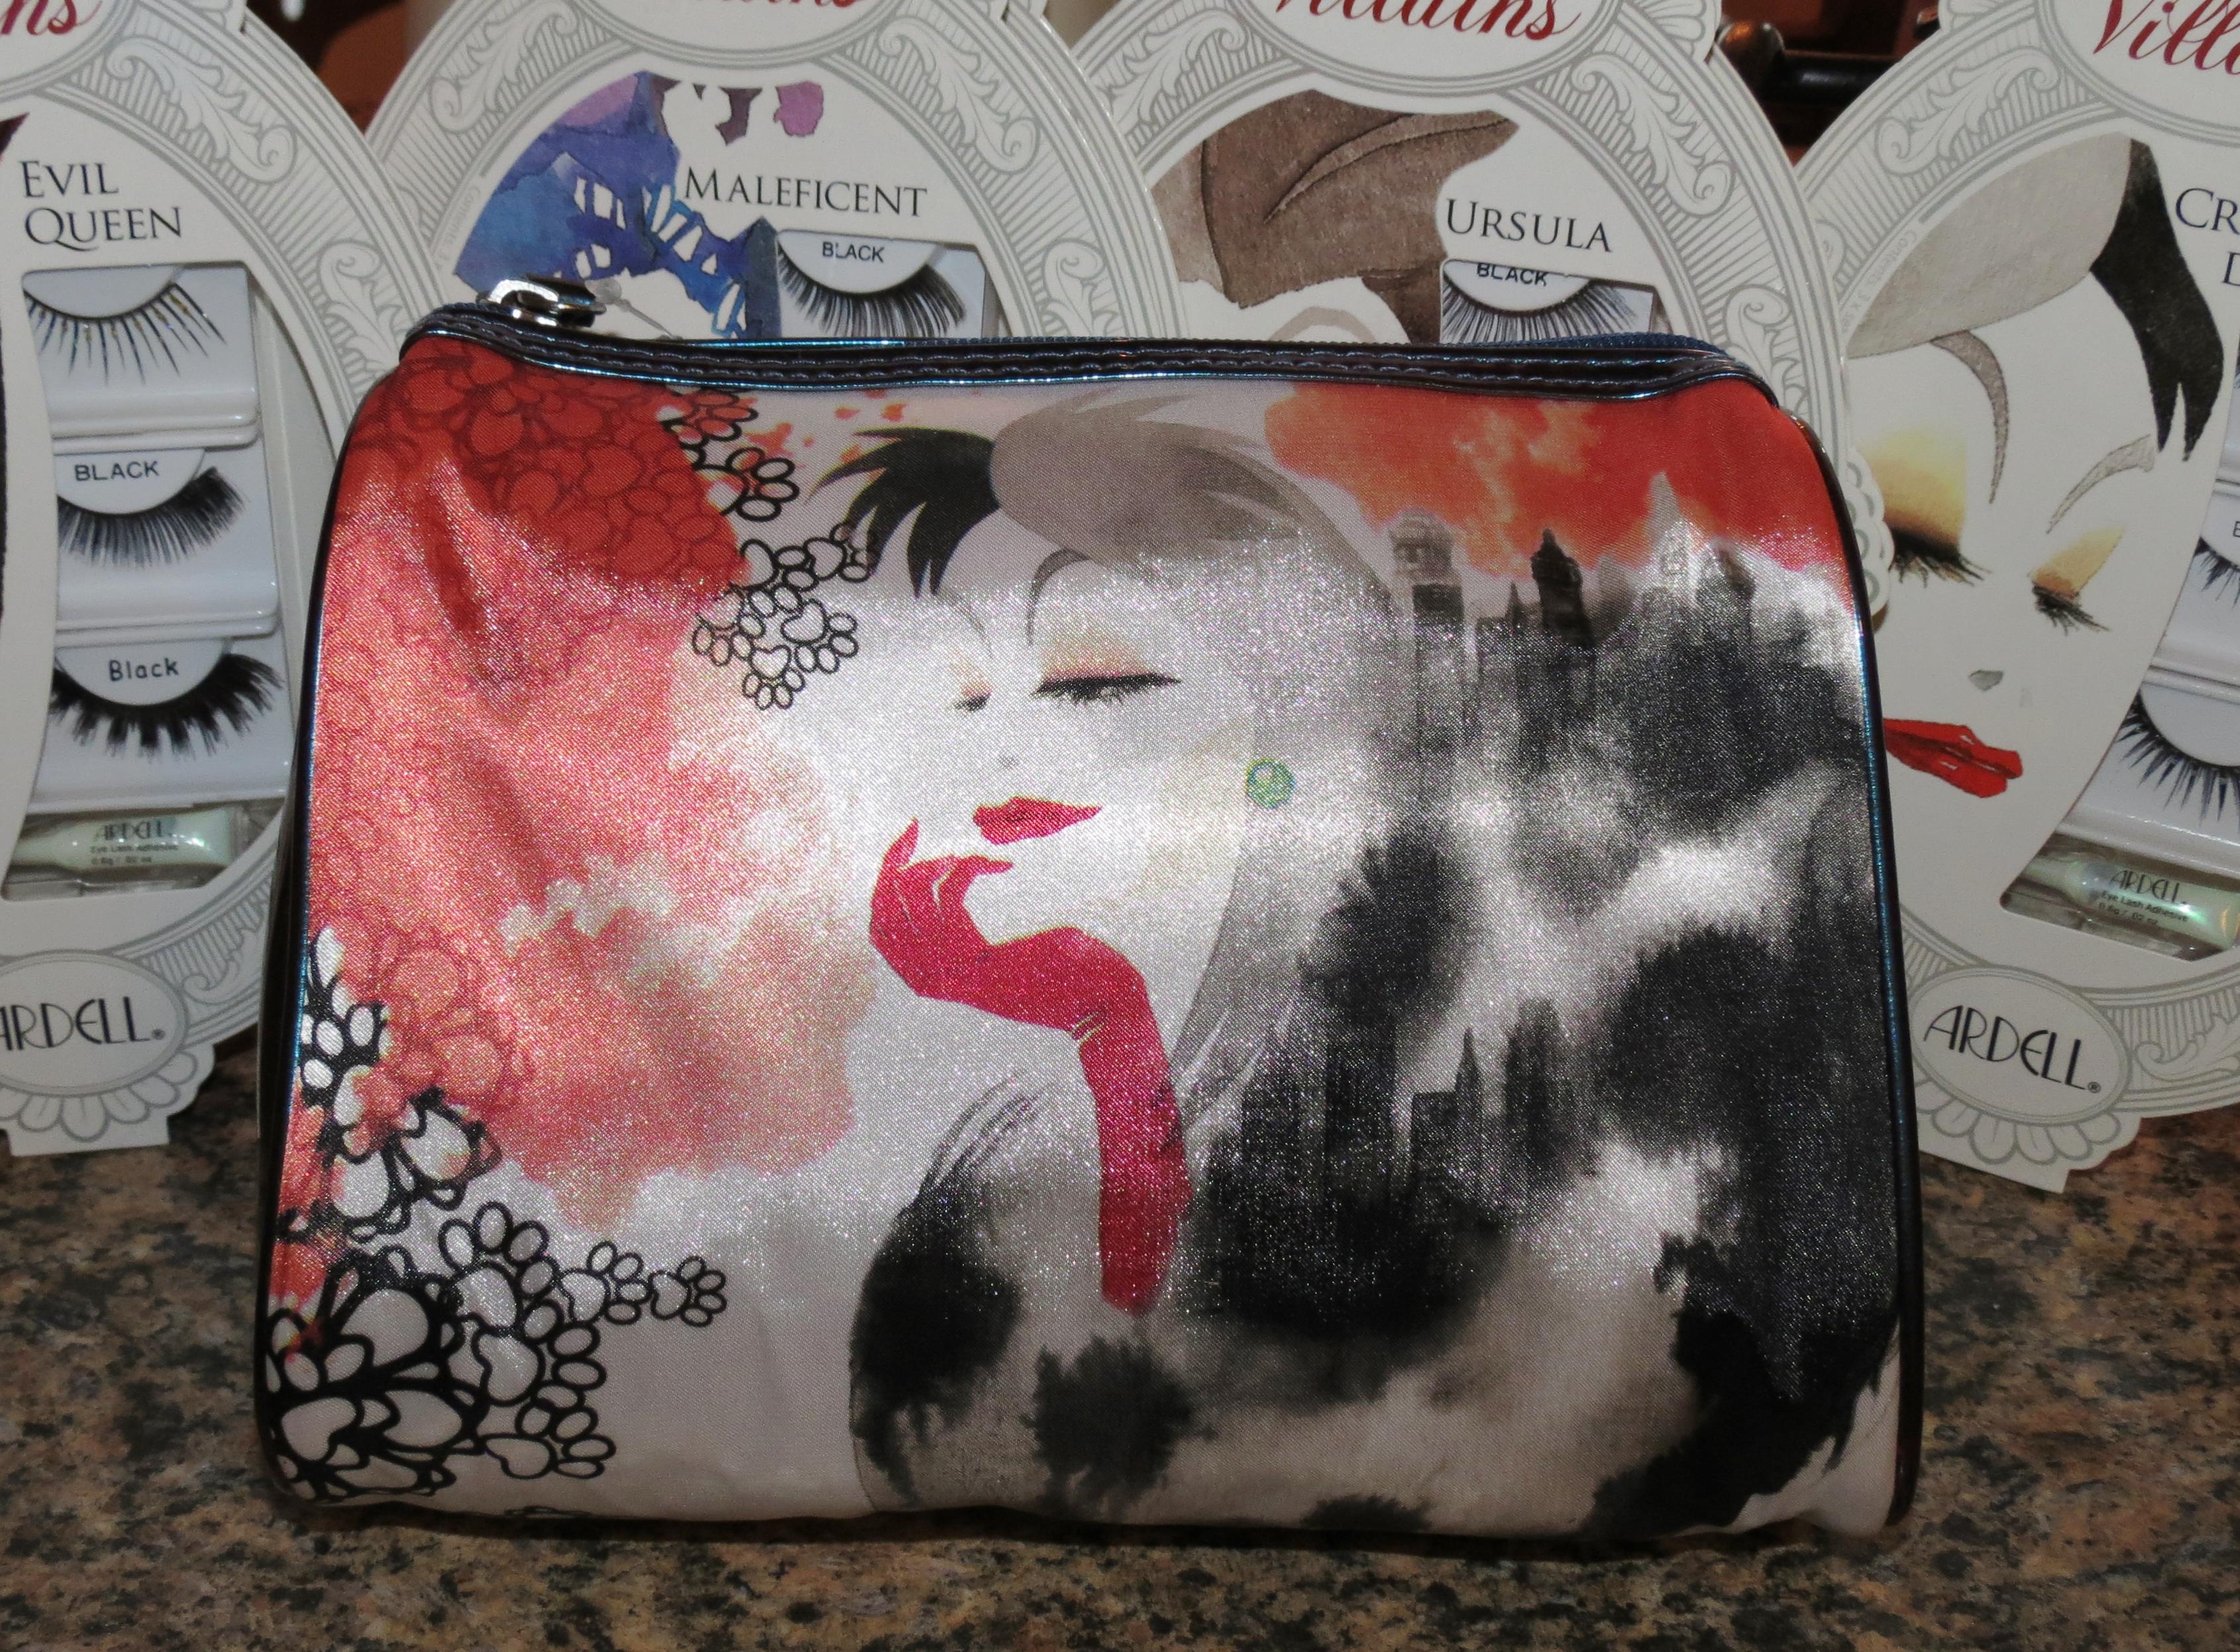 Maleficent Disney Villain Fabric Pencil Pouch//Makeup Bag Ursula Cruella de Vil